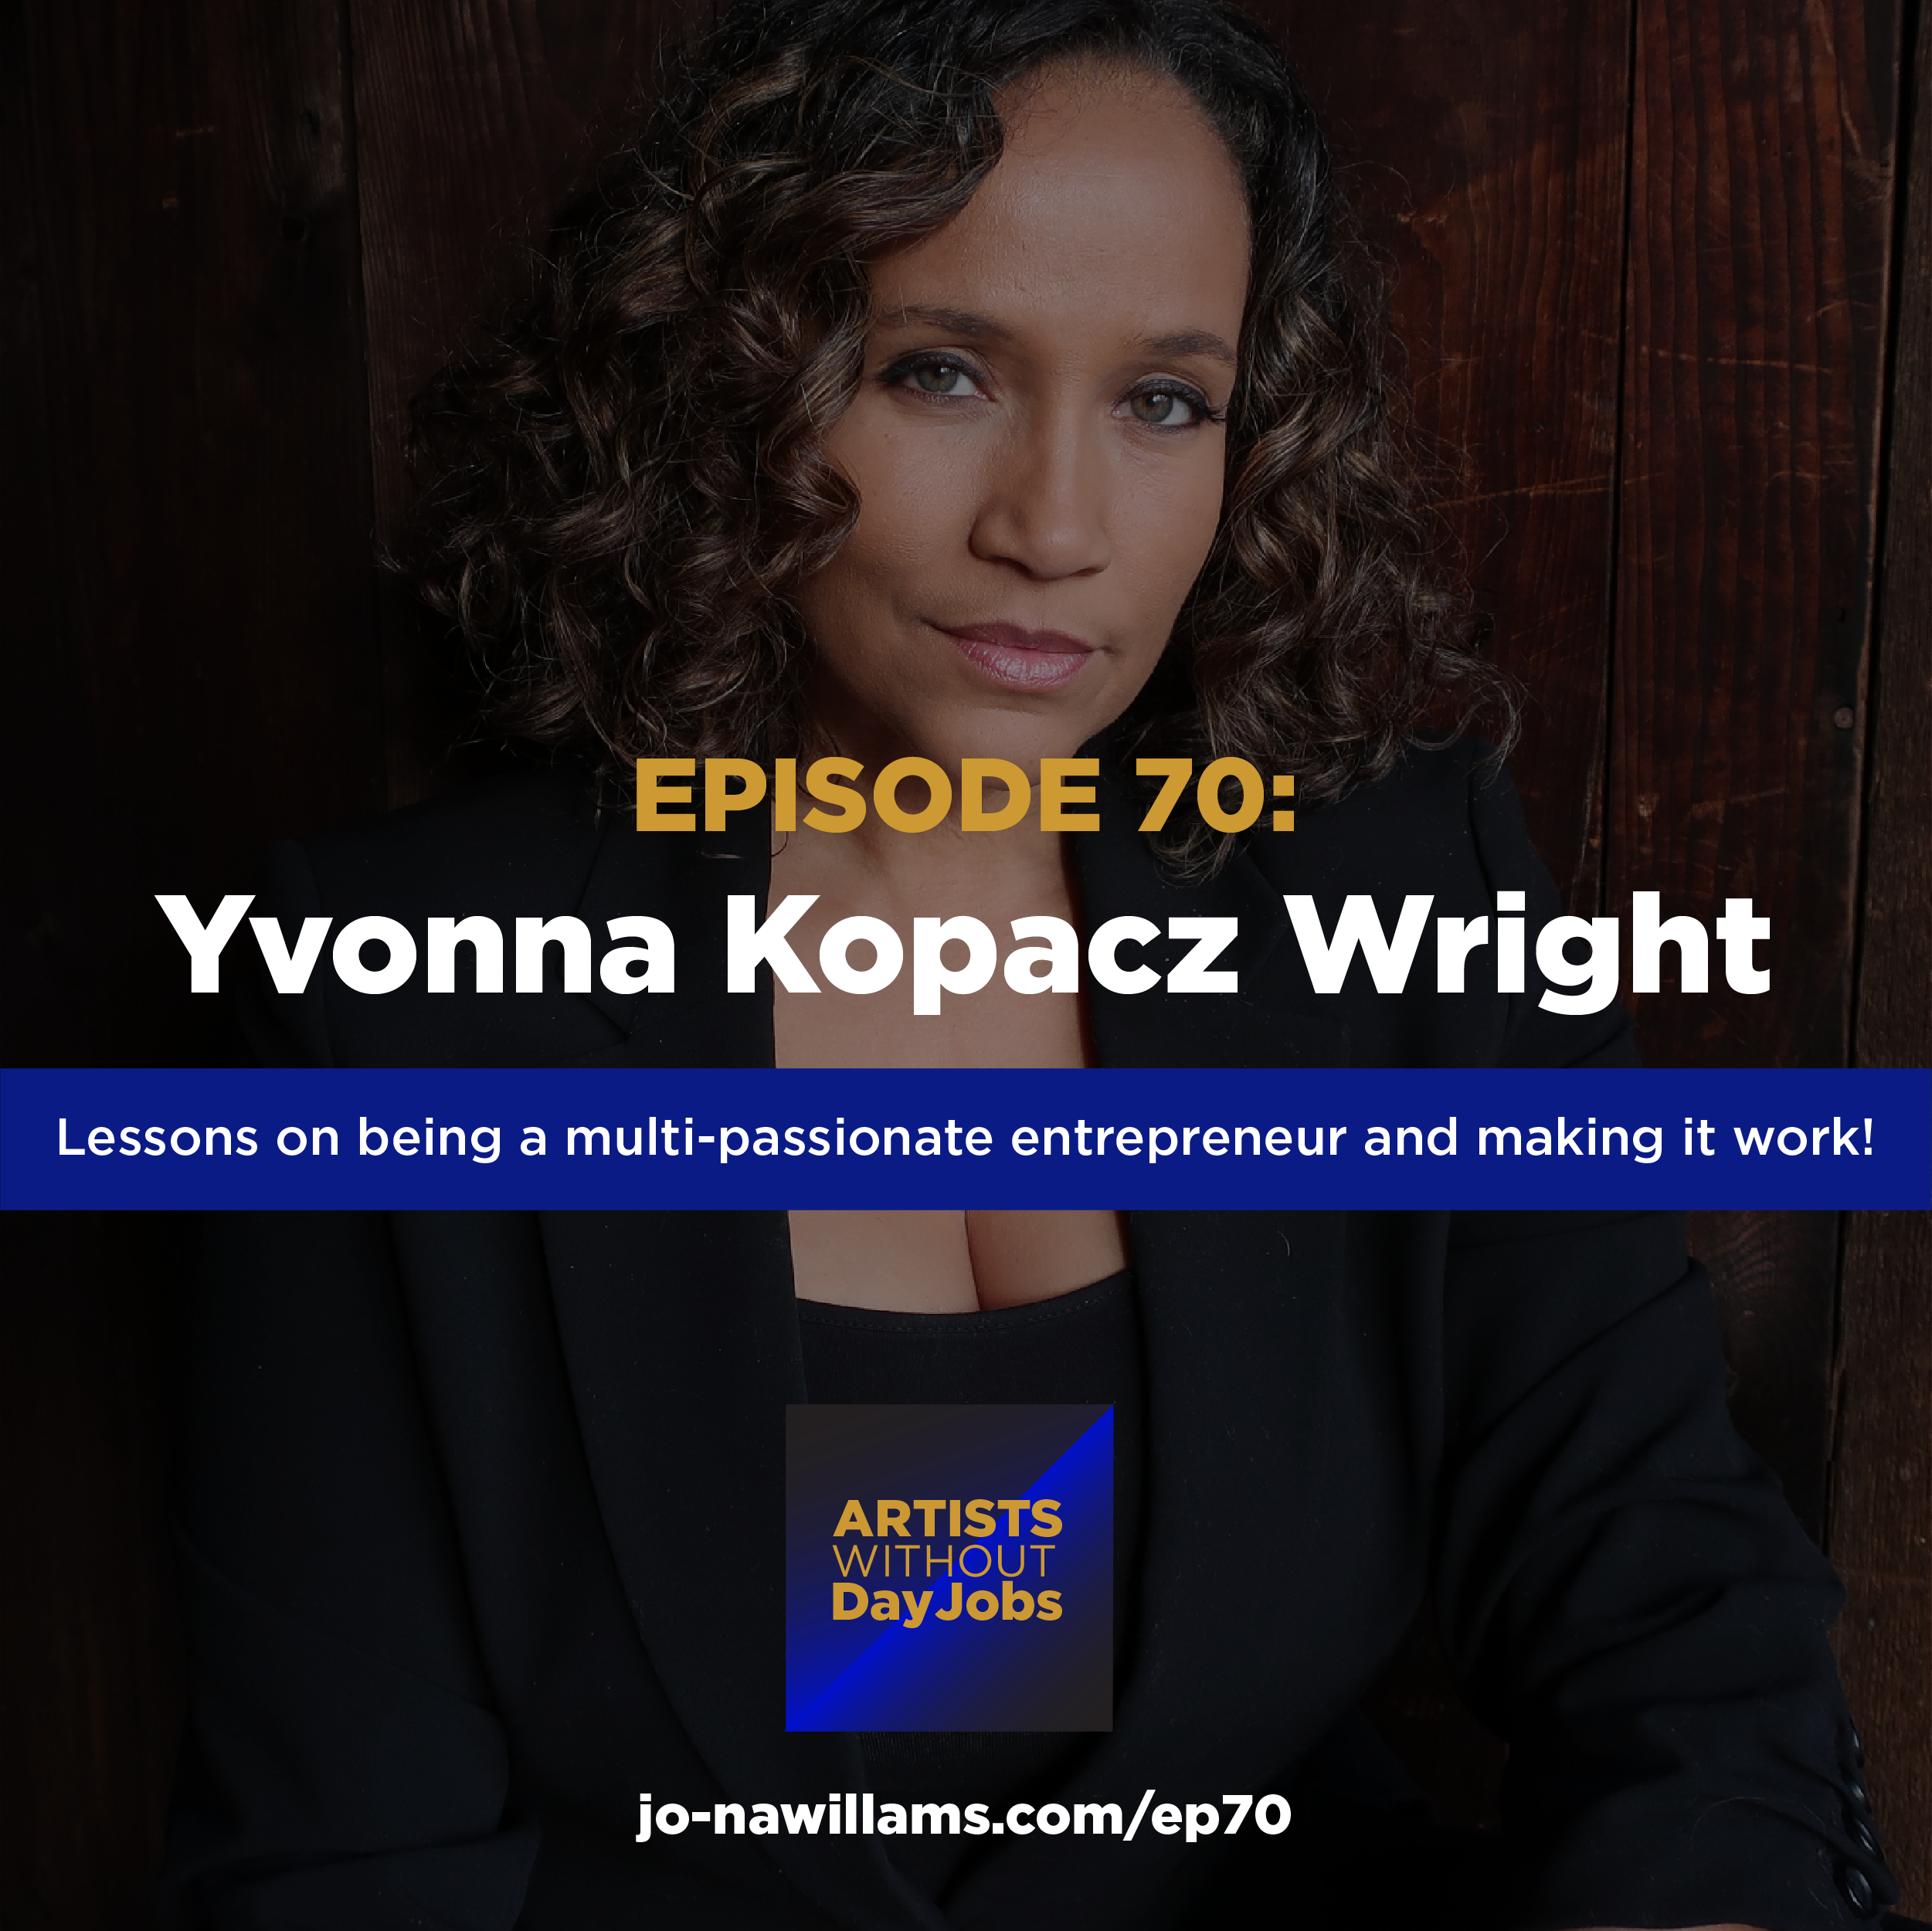 Ep 70: Being a multi-passionate entrepreneur w/ Yvonna Kopacz